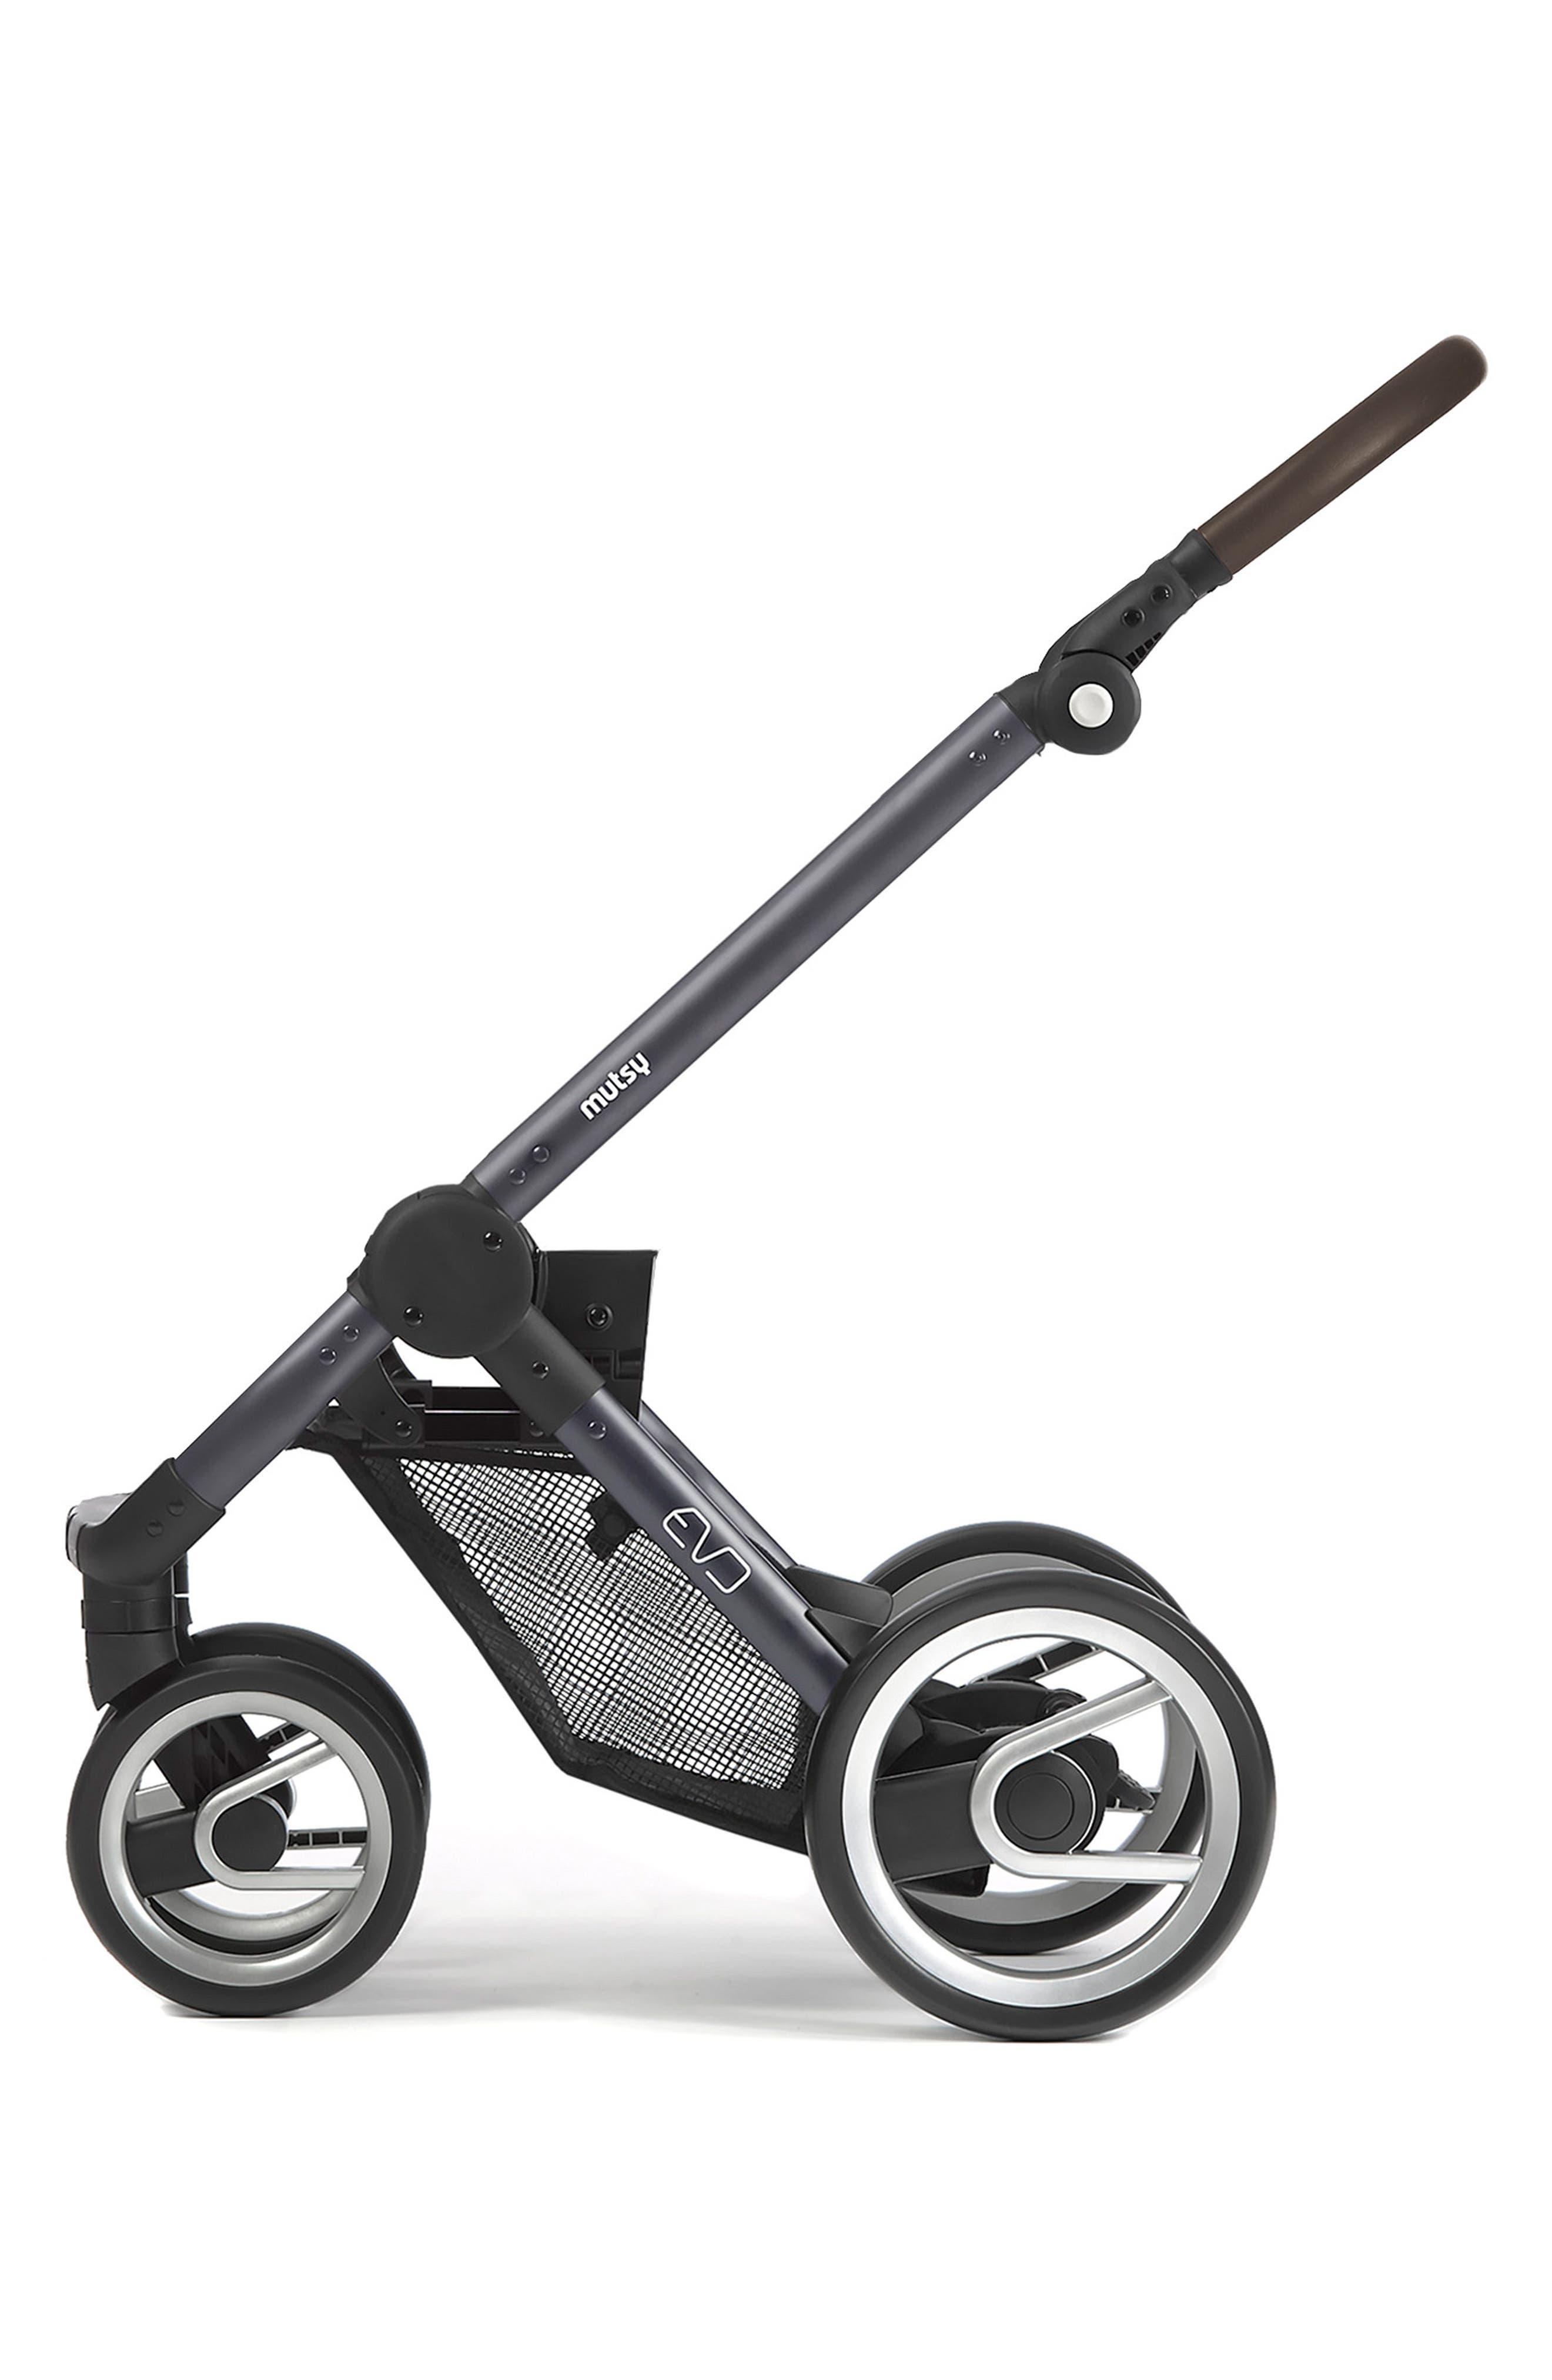 Evo - Farmer Earth Stroller,                             Alternate thumbnail 3, color,                             GREY